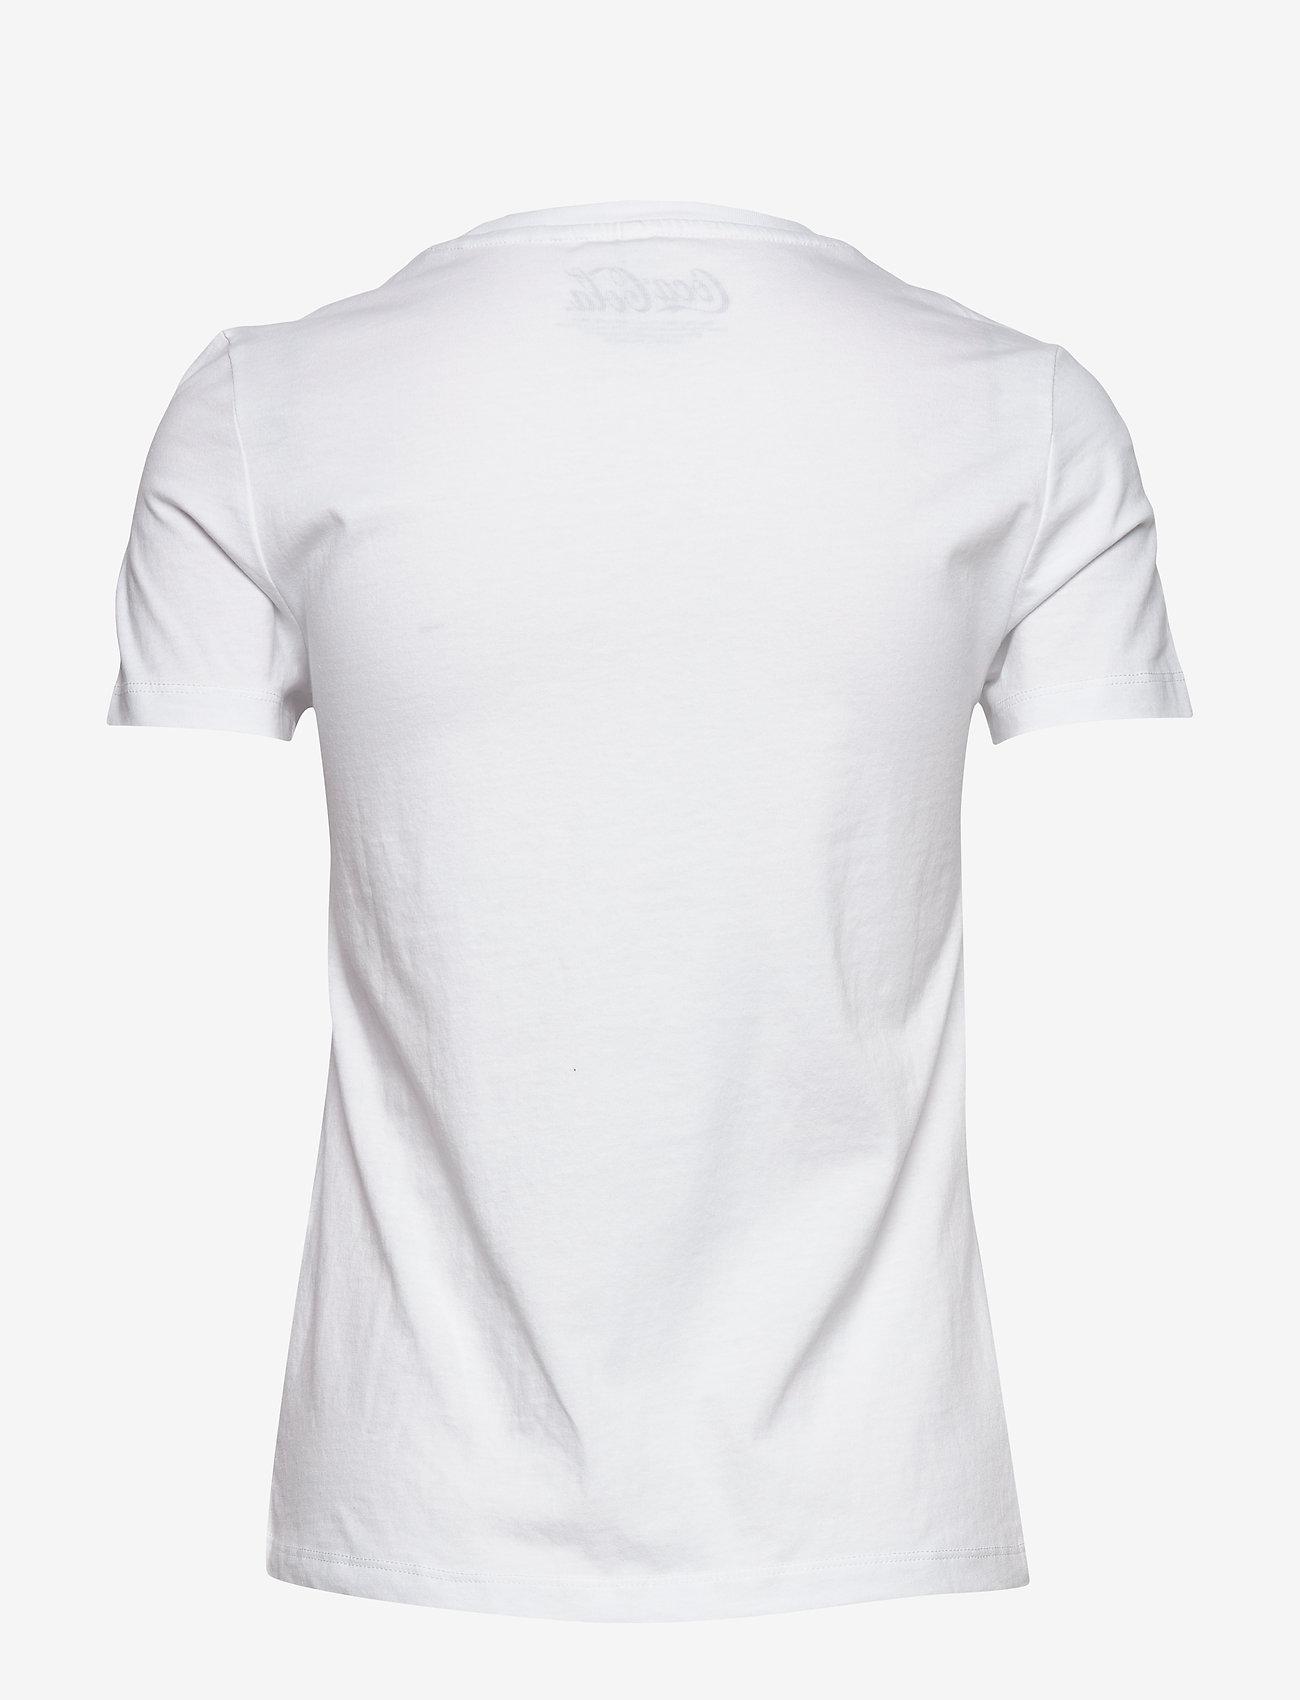 ONLY - ONLCOKE LIFE REG S/S RETRO TOP BOX JRS - printed t-shirts - bright white